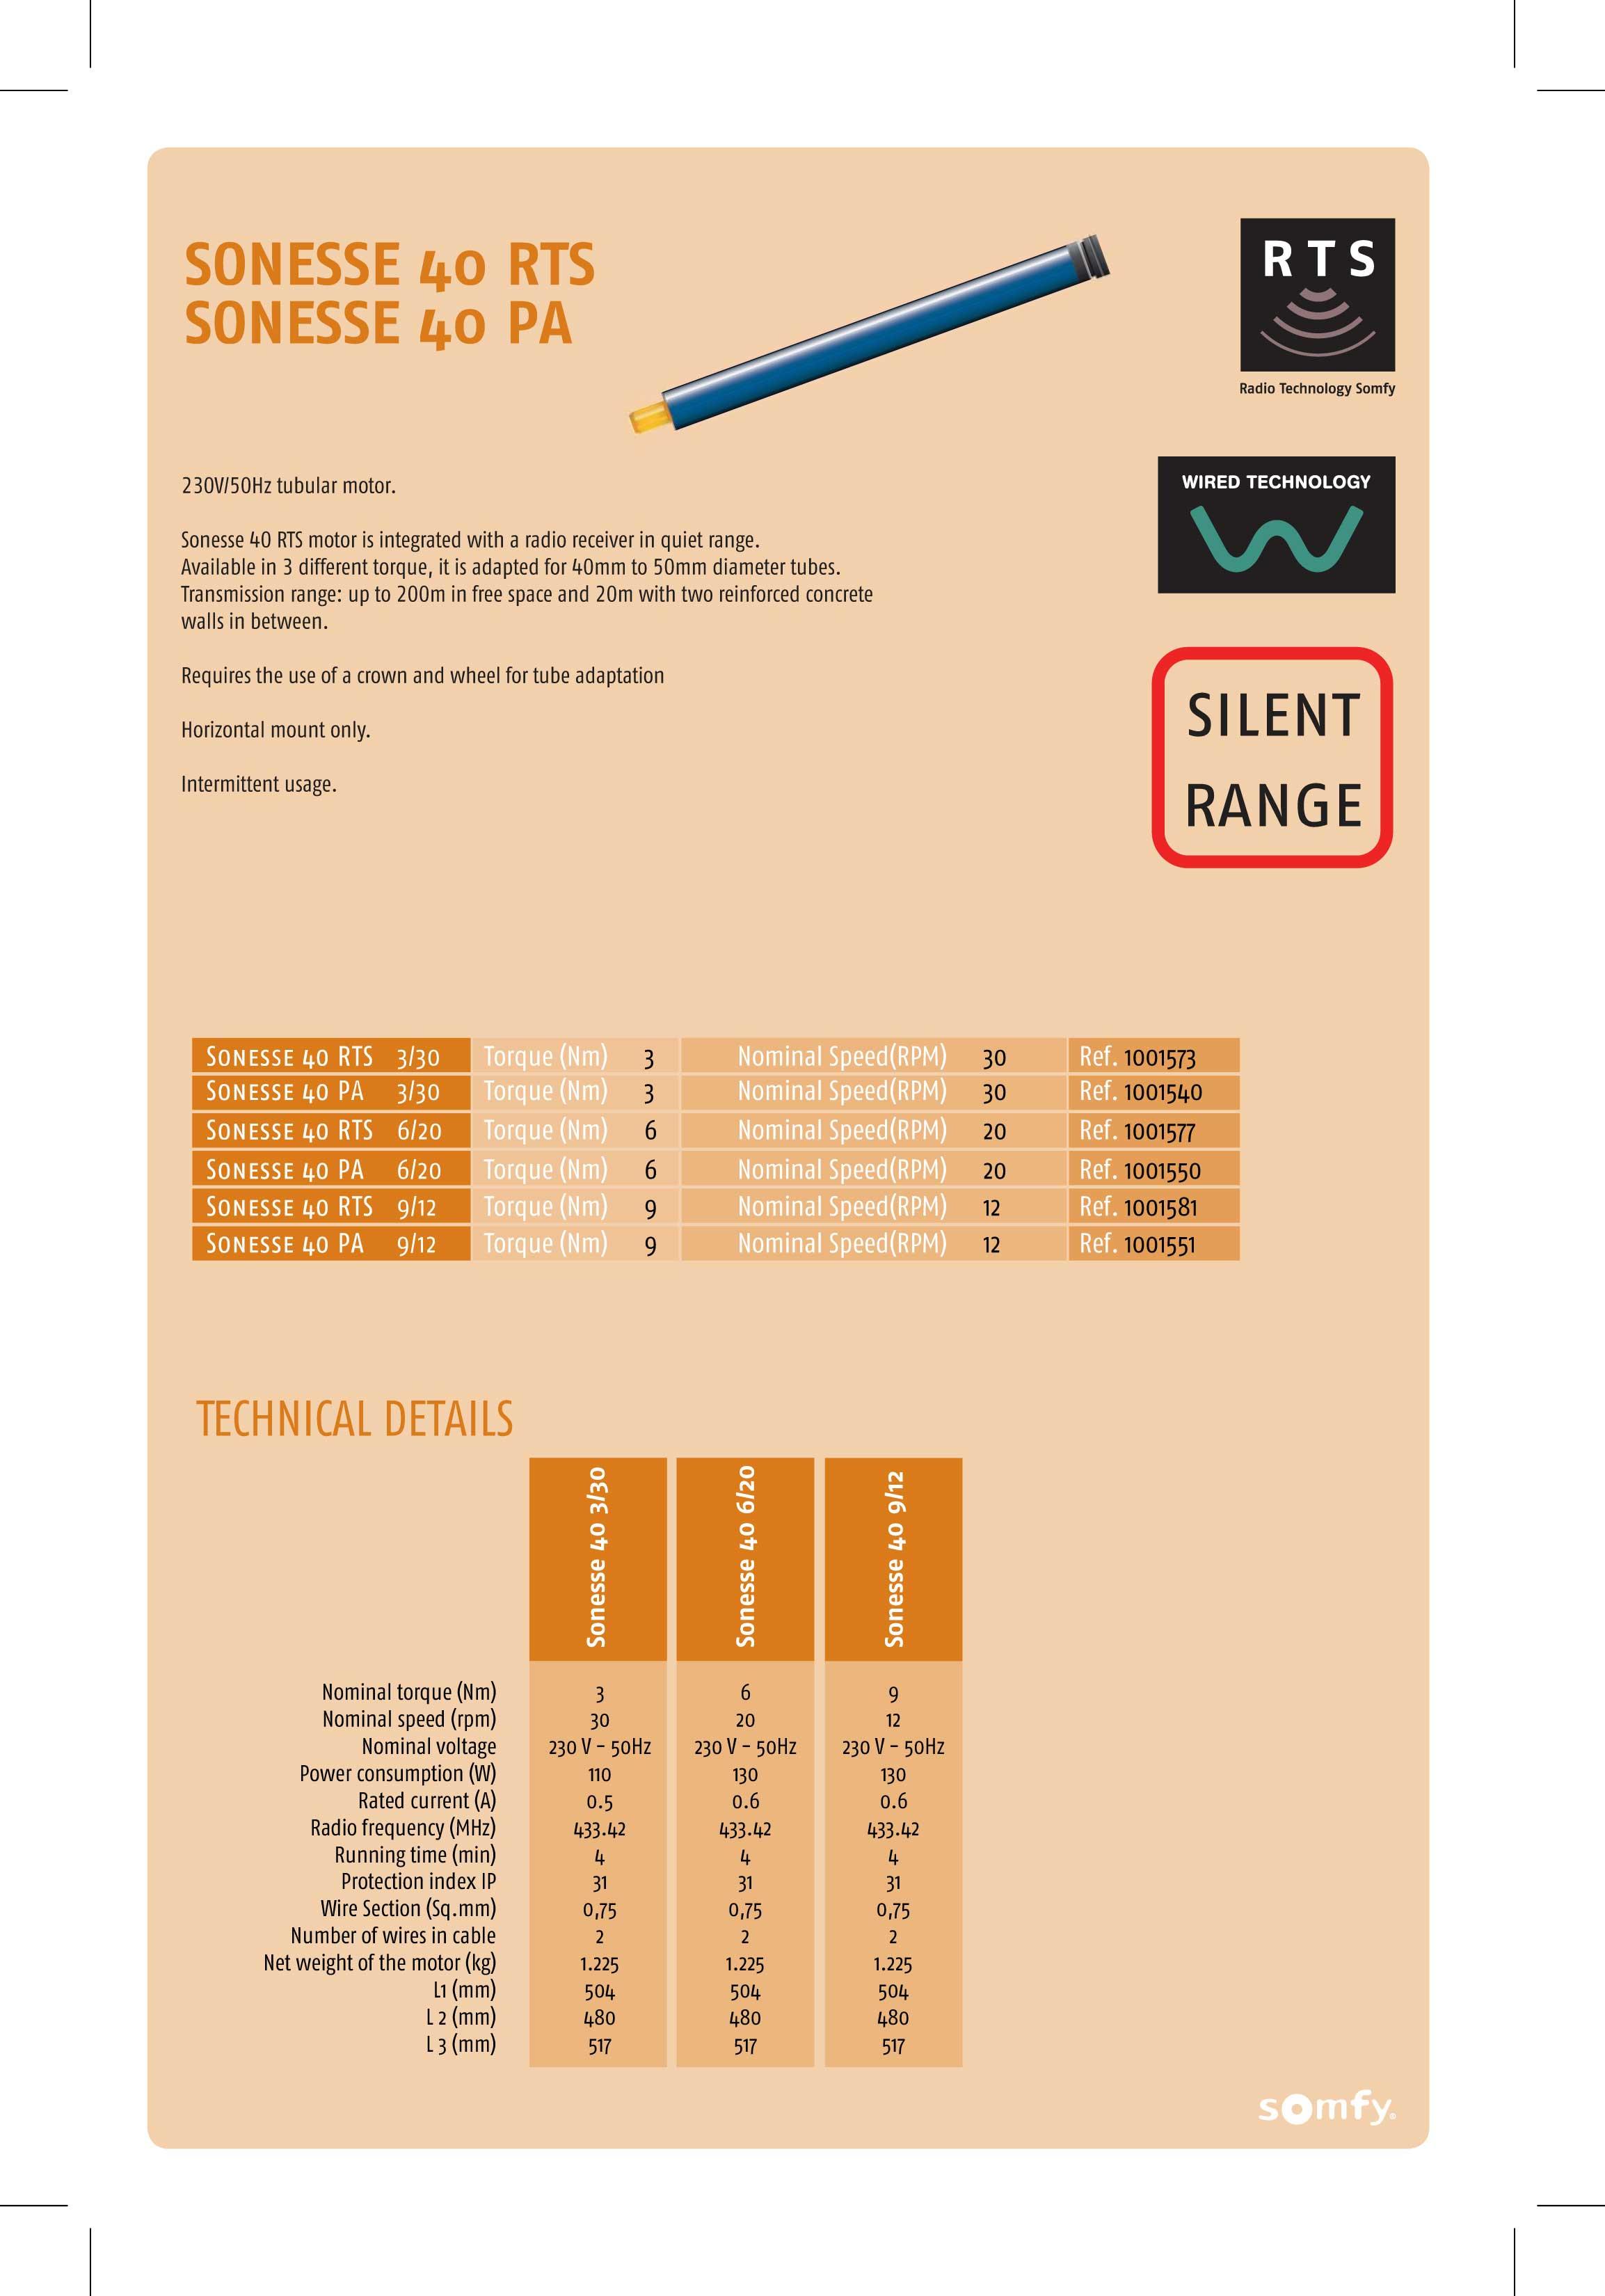 Somfy Sonesse 40 Rts Wiring Diagram Electrical Motor Motors Controls Proshade Sal Rh Proshadesal Com Socket Systems Diagrams